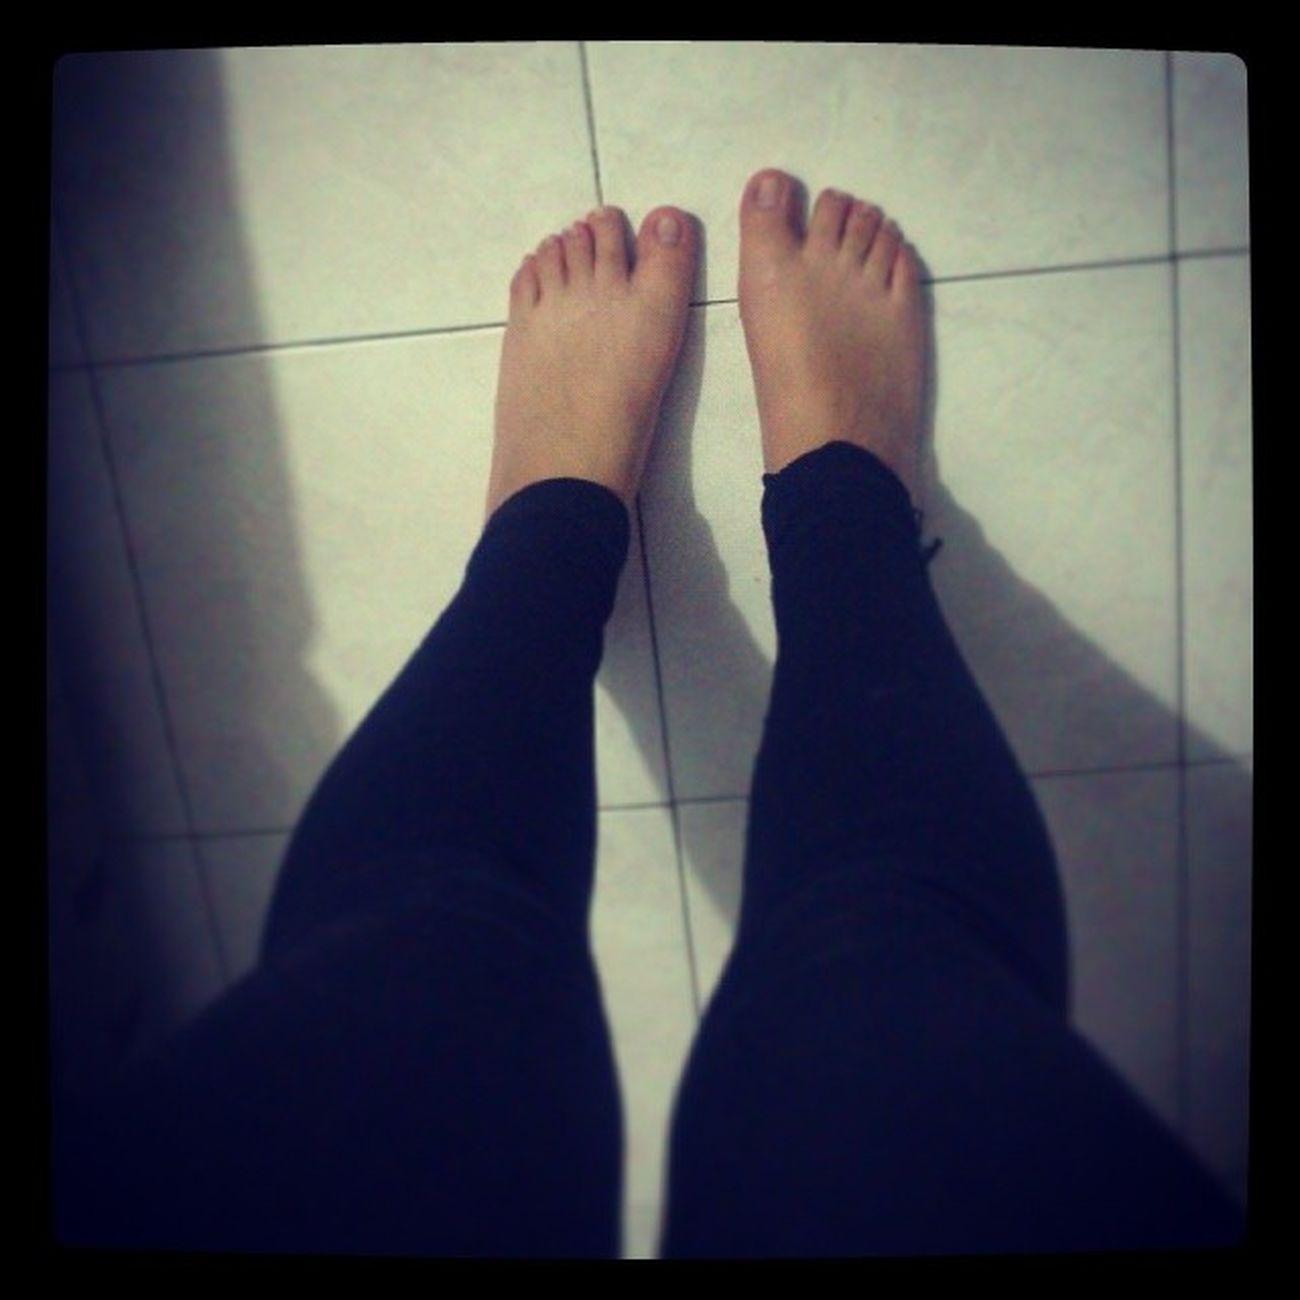 Nada mejor q andar descalza... :3 100happydays Day5 Barefoottime